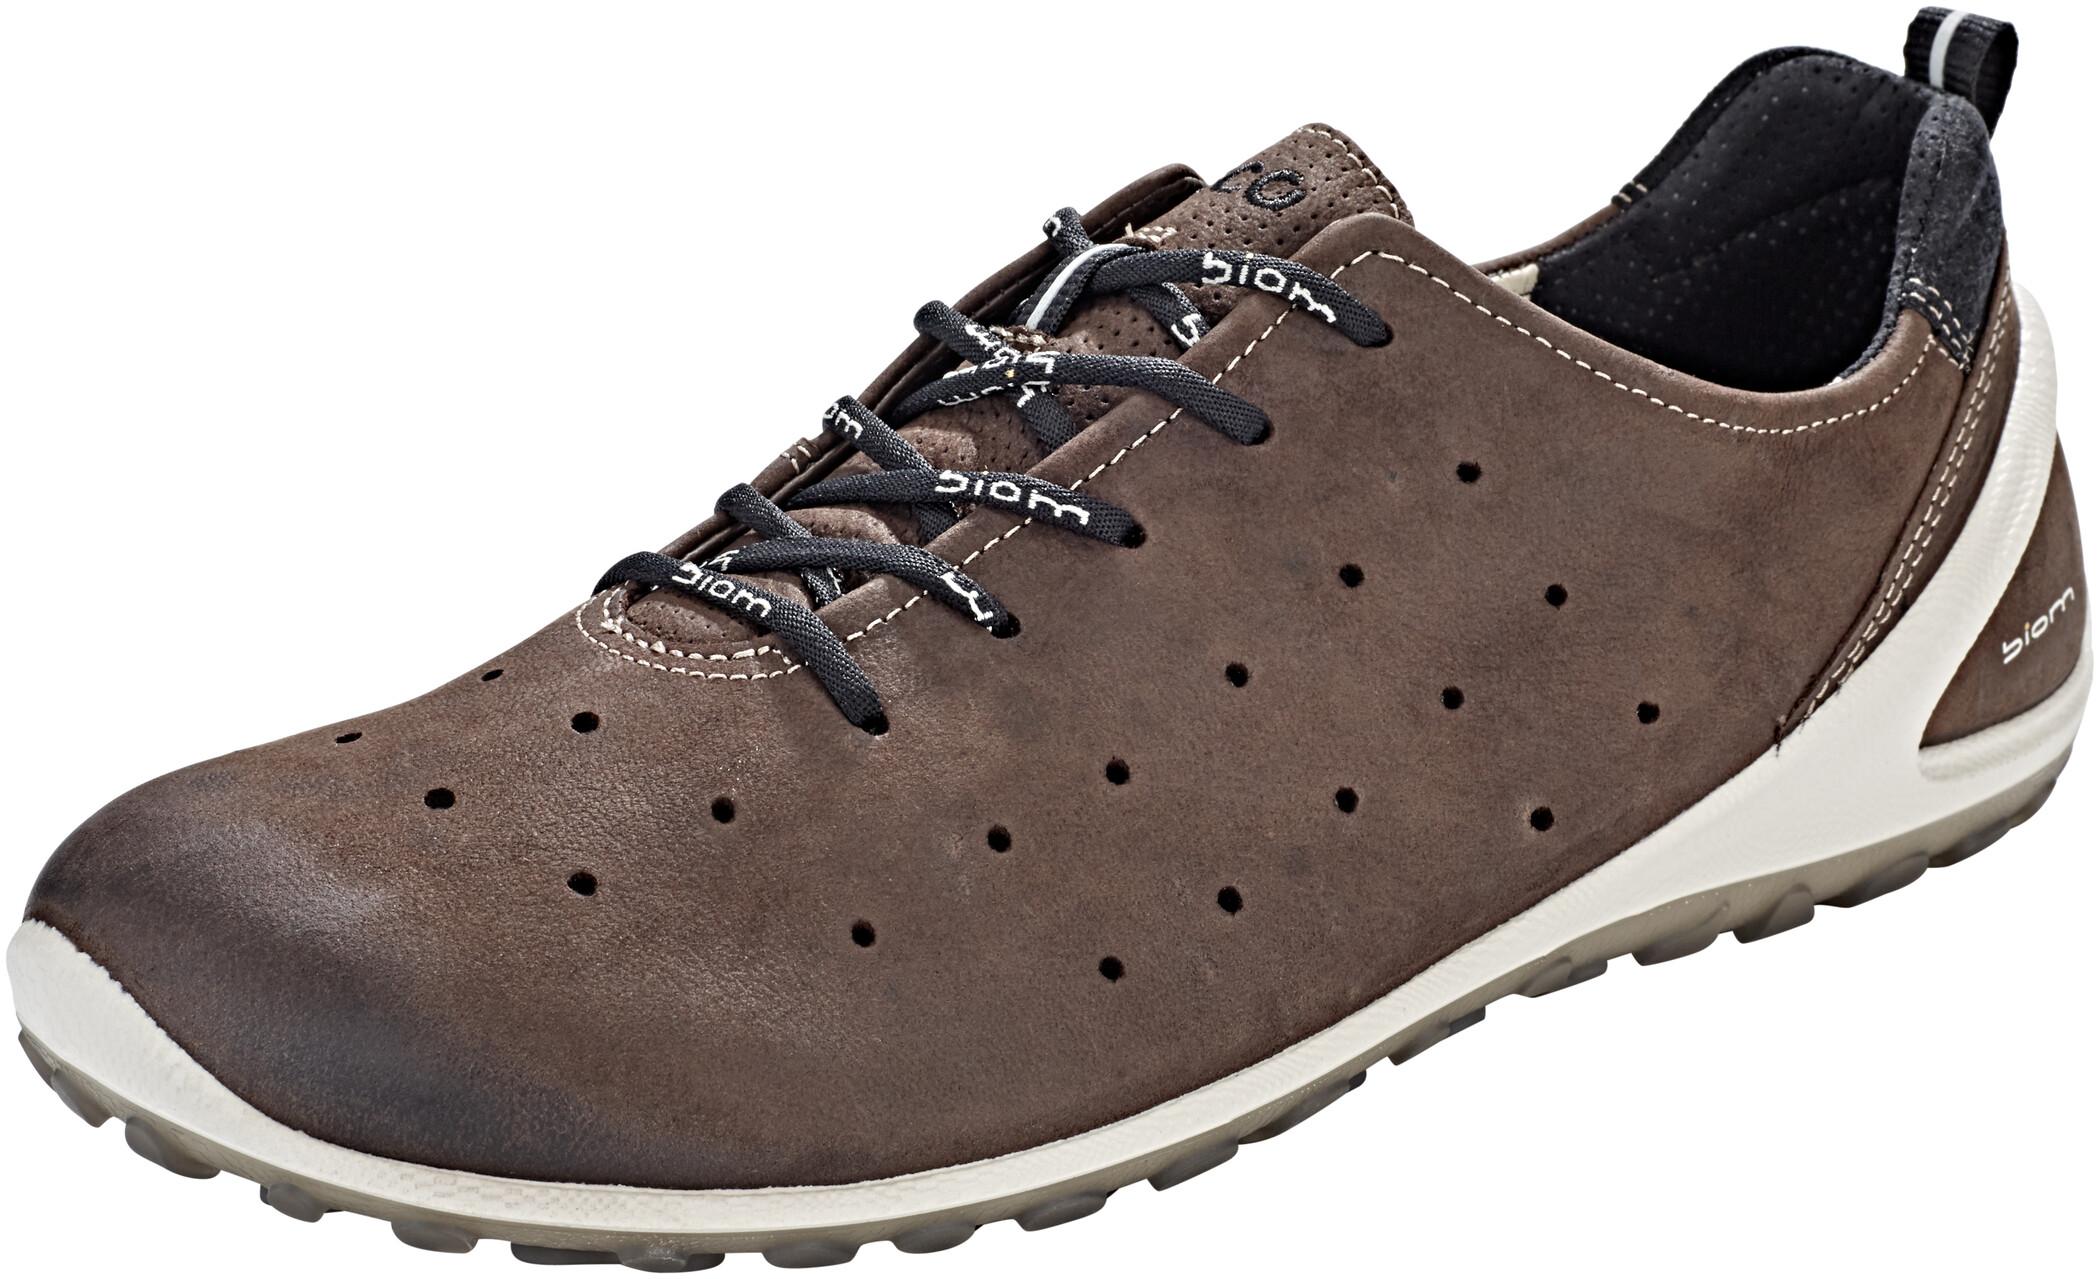 ECCO Men's Biom Lite Low Top Sneakers